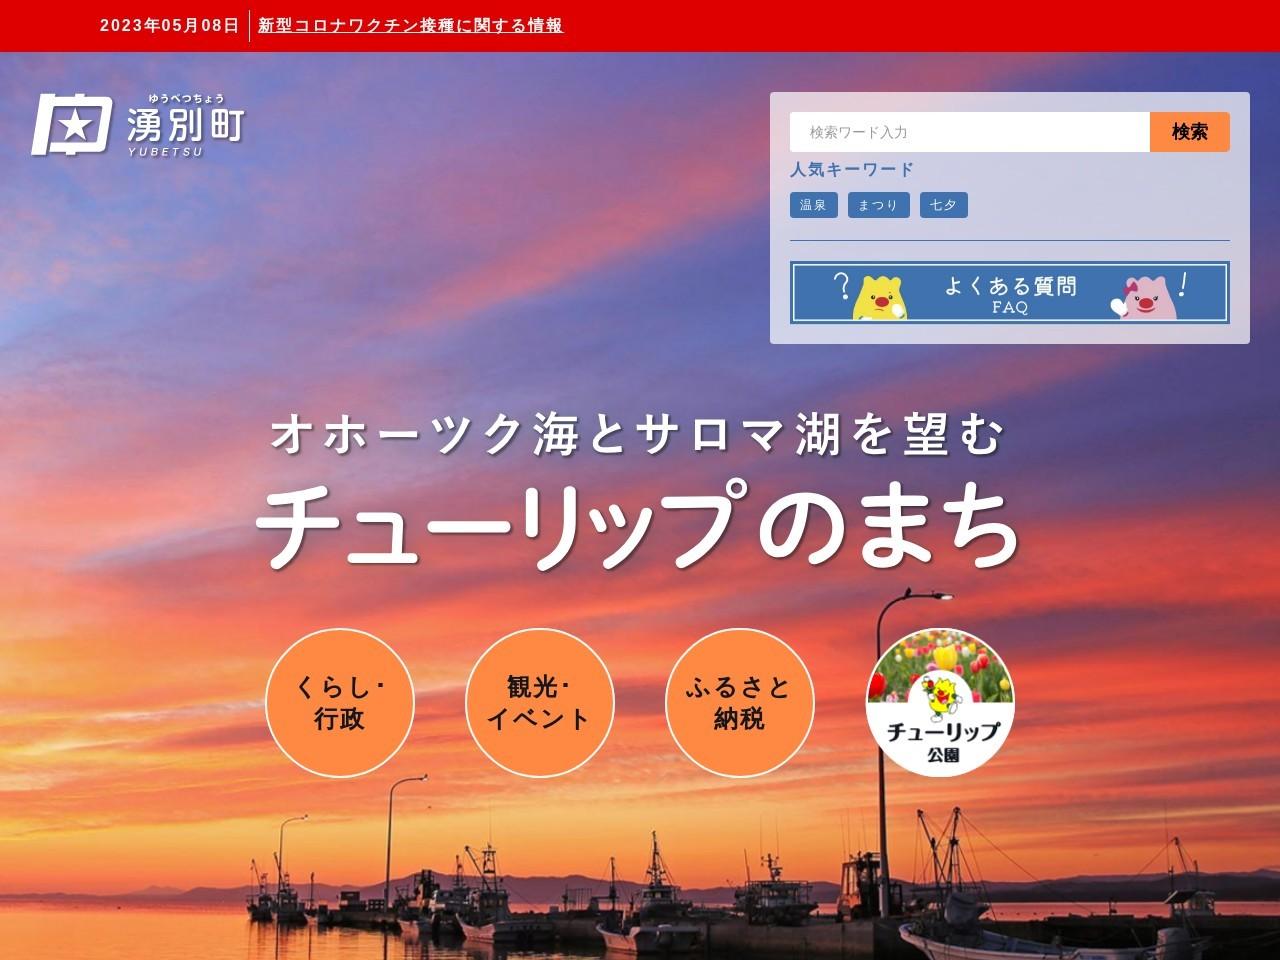 https://www.town.yubetsu.lg.jp/50shisetsu/6nou-kankou/camp-sanrihama.html